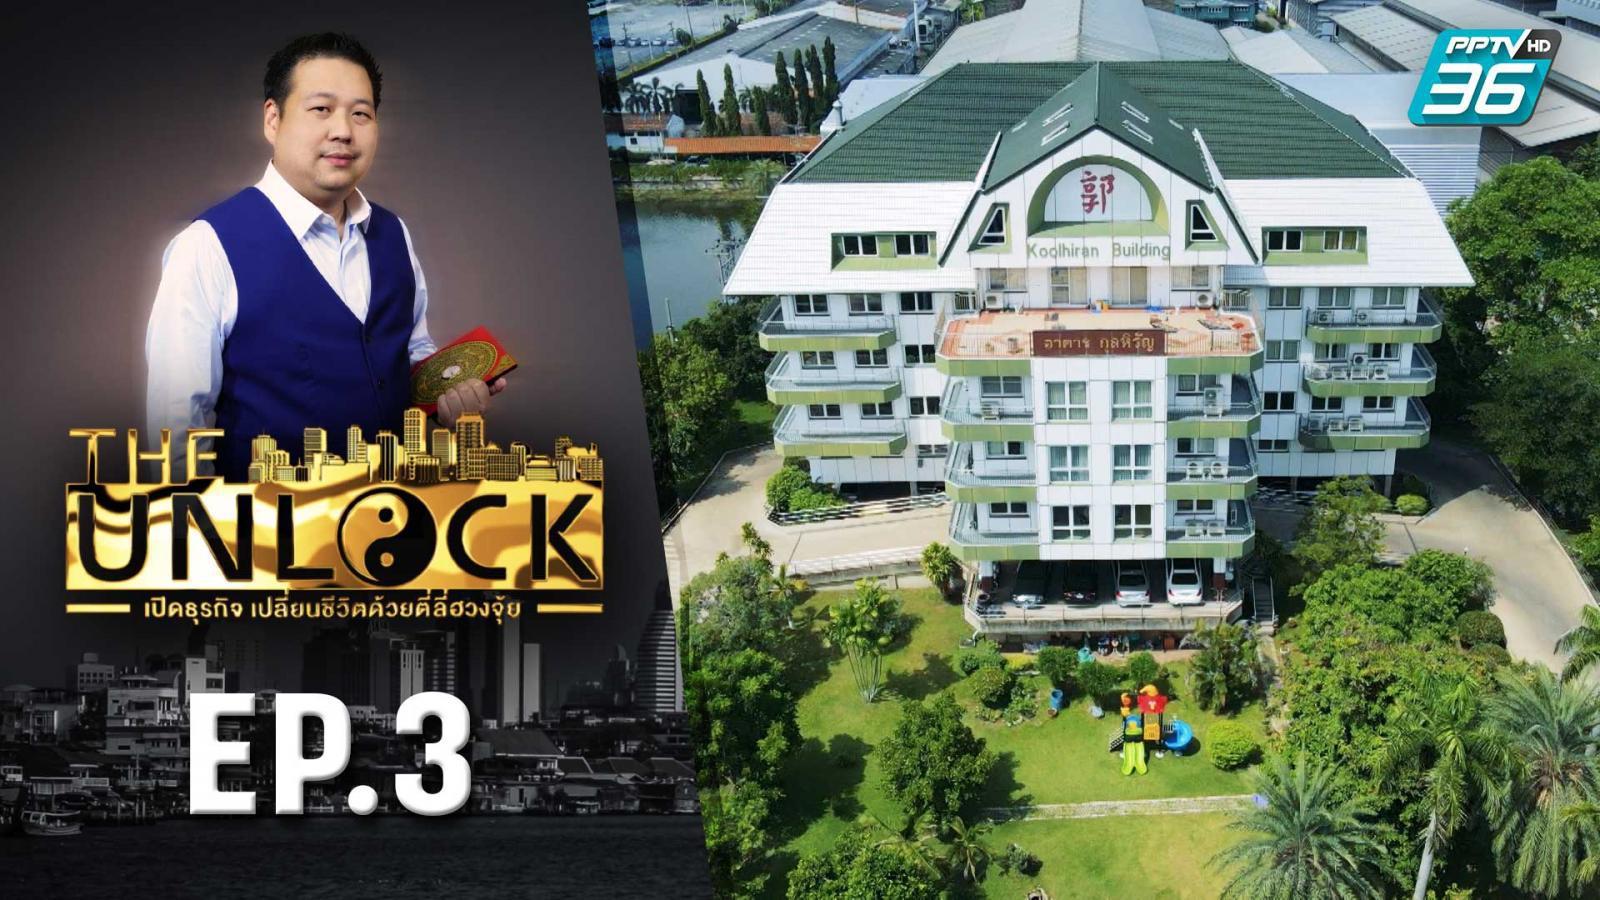 The Unlock เปิดธุรกิจ เปลี่ยนชีวิตด้วยตี่ลี่ฮวงจุ้ย | ตอน โรงงานชัยเสรีเม็ททอลแอนด์รับเบอร์ ( มาดามรถถัง ) EP.3 | PPTV HD 36